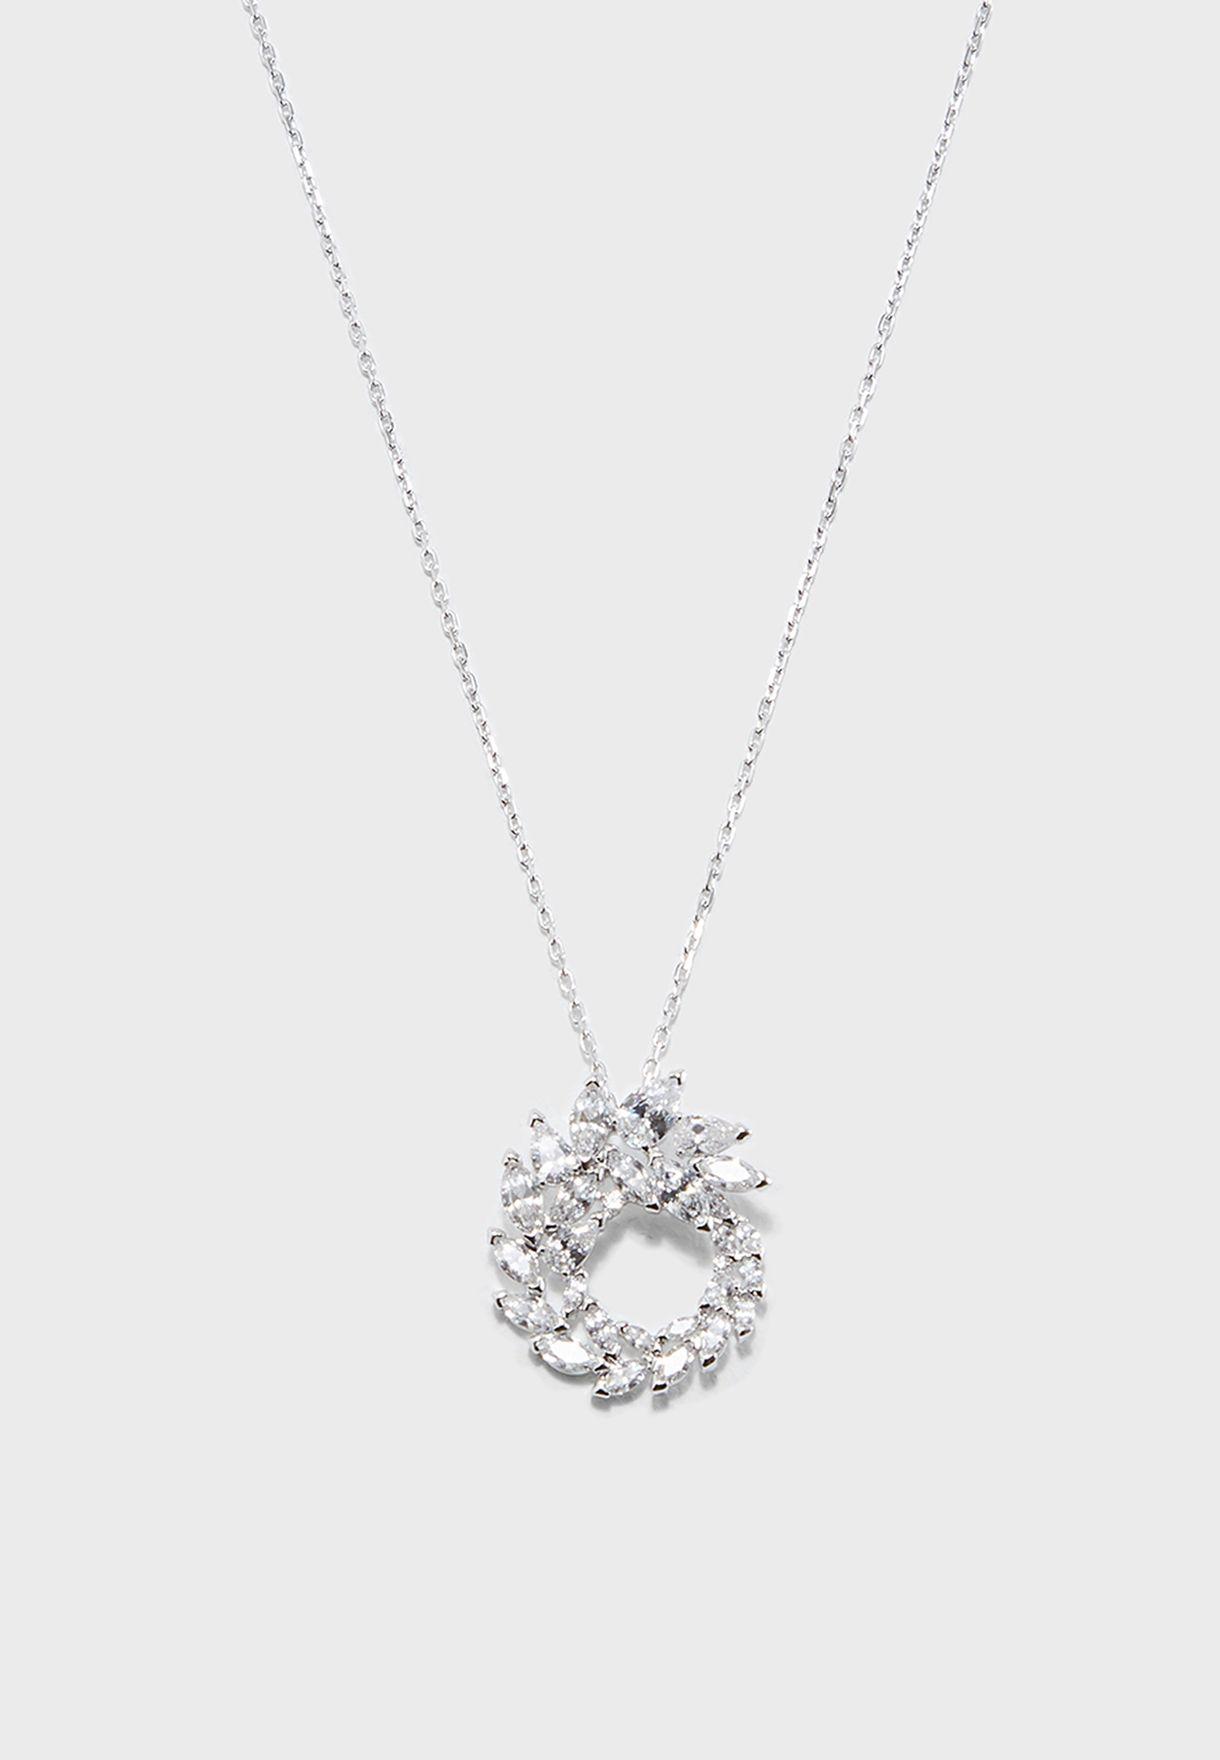 Louison Necklace With Pendant